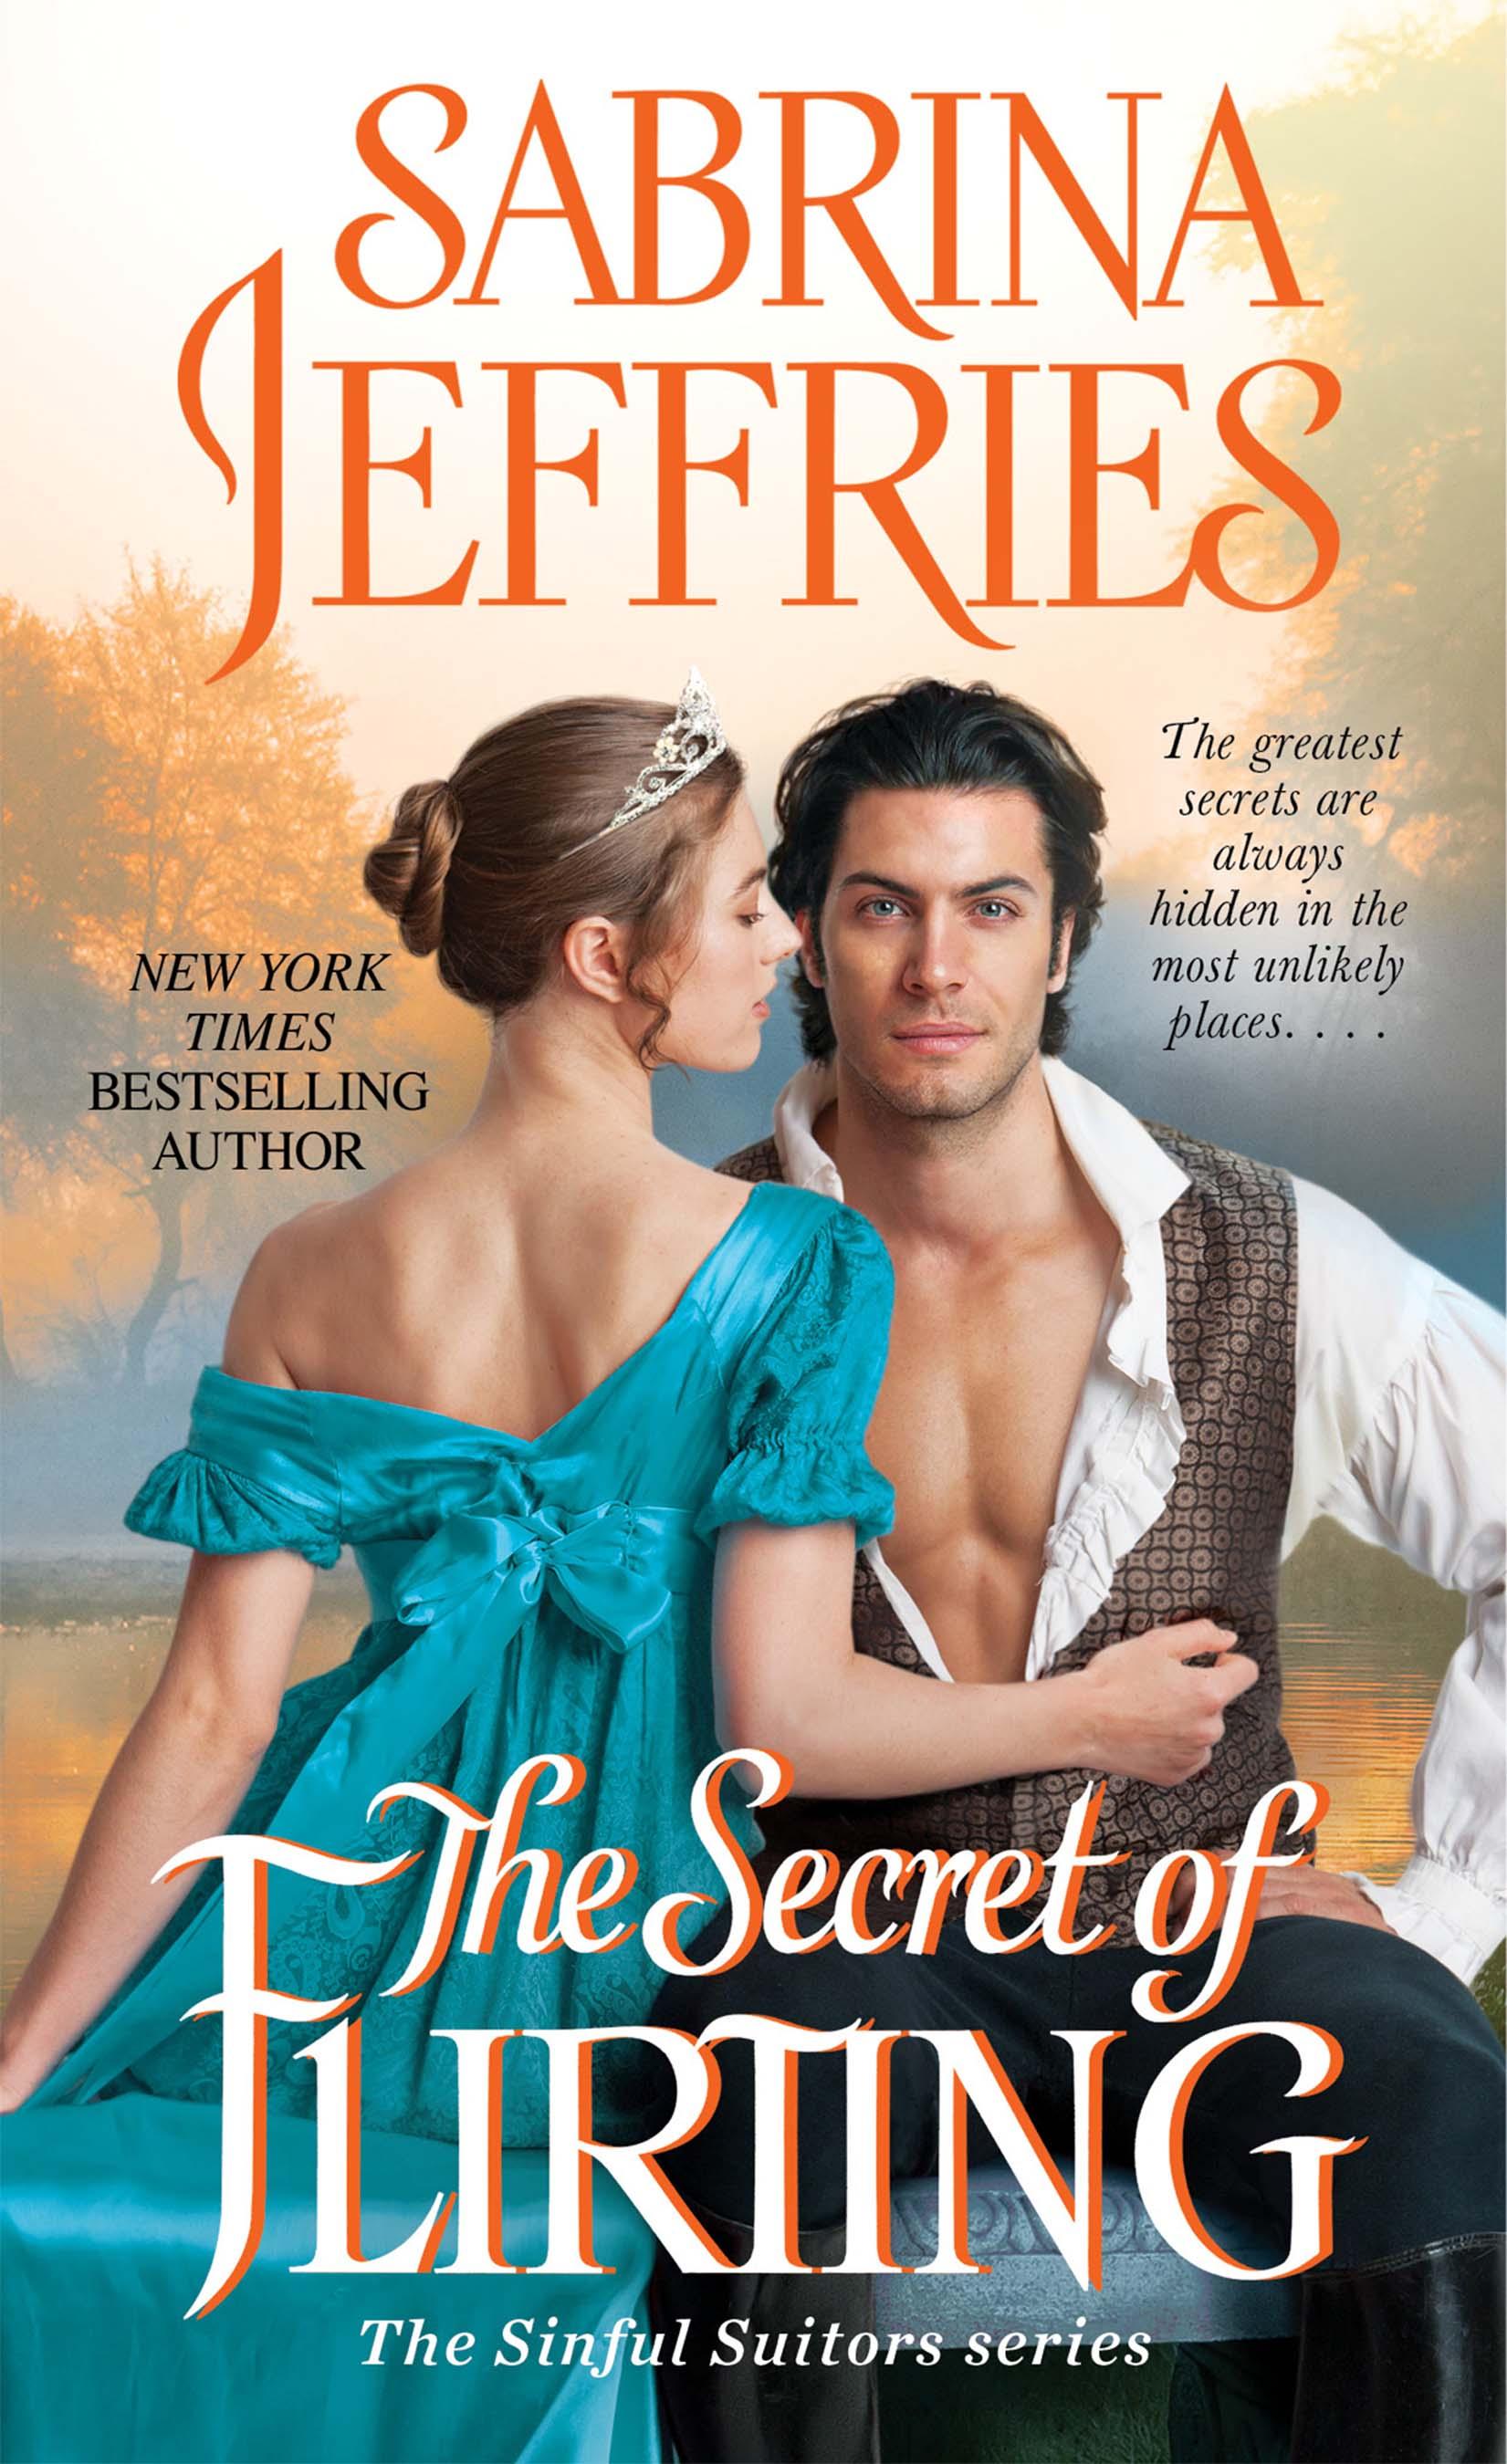 The Secret of Flirting , by Sabrina Jeffries